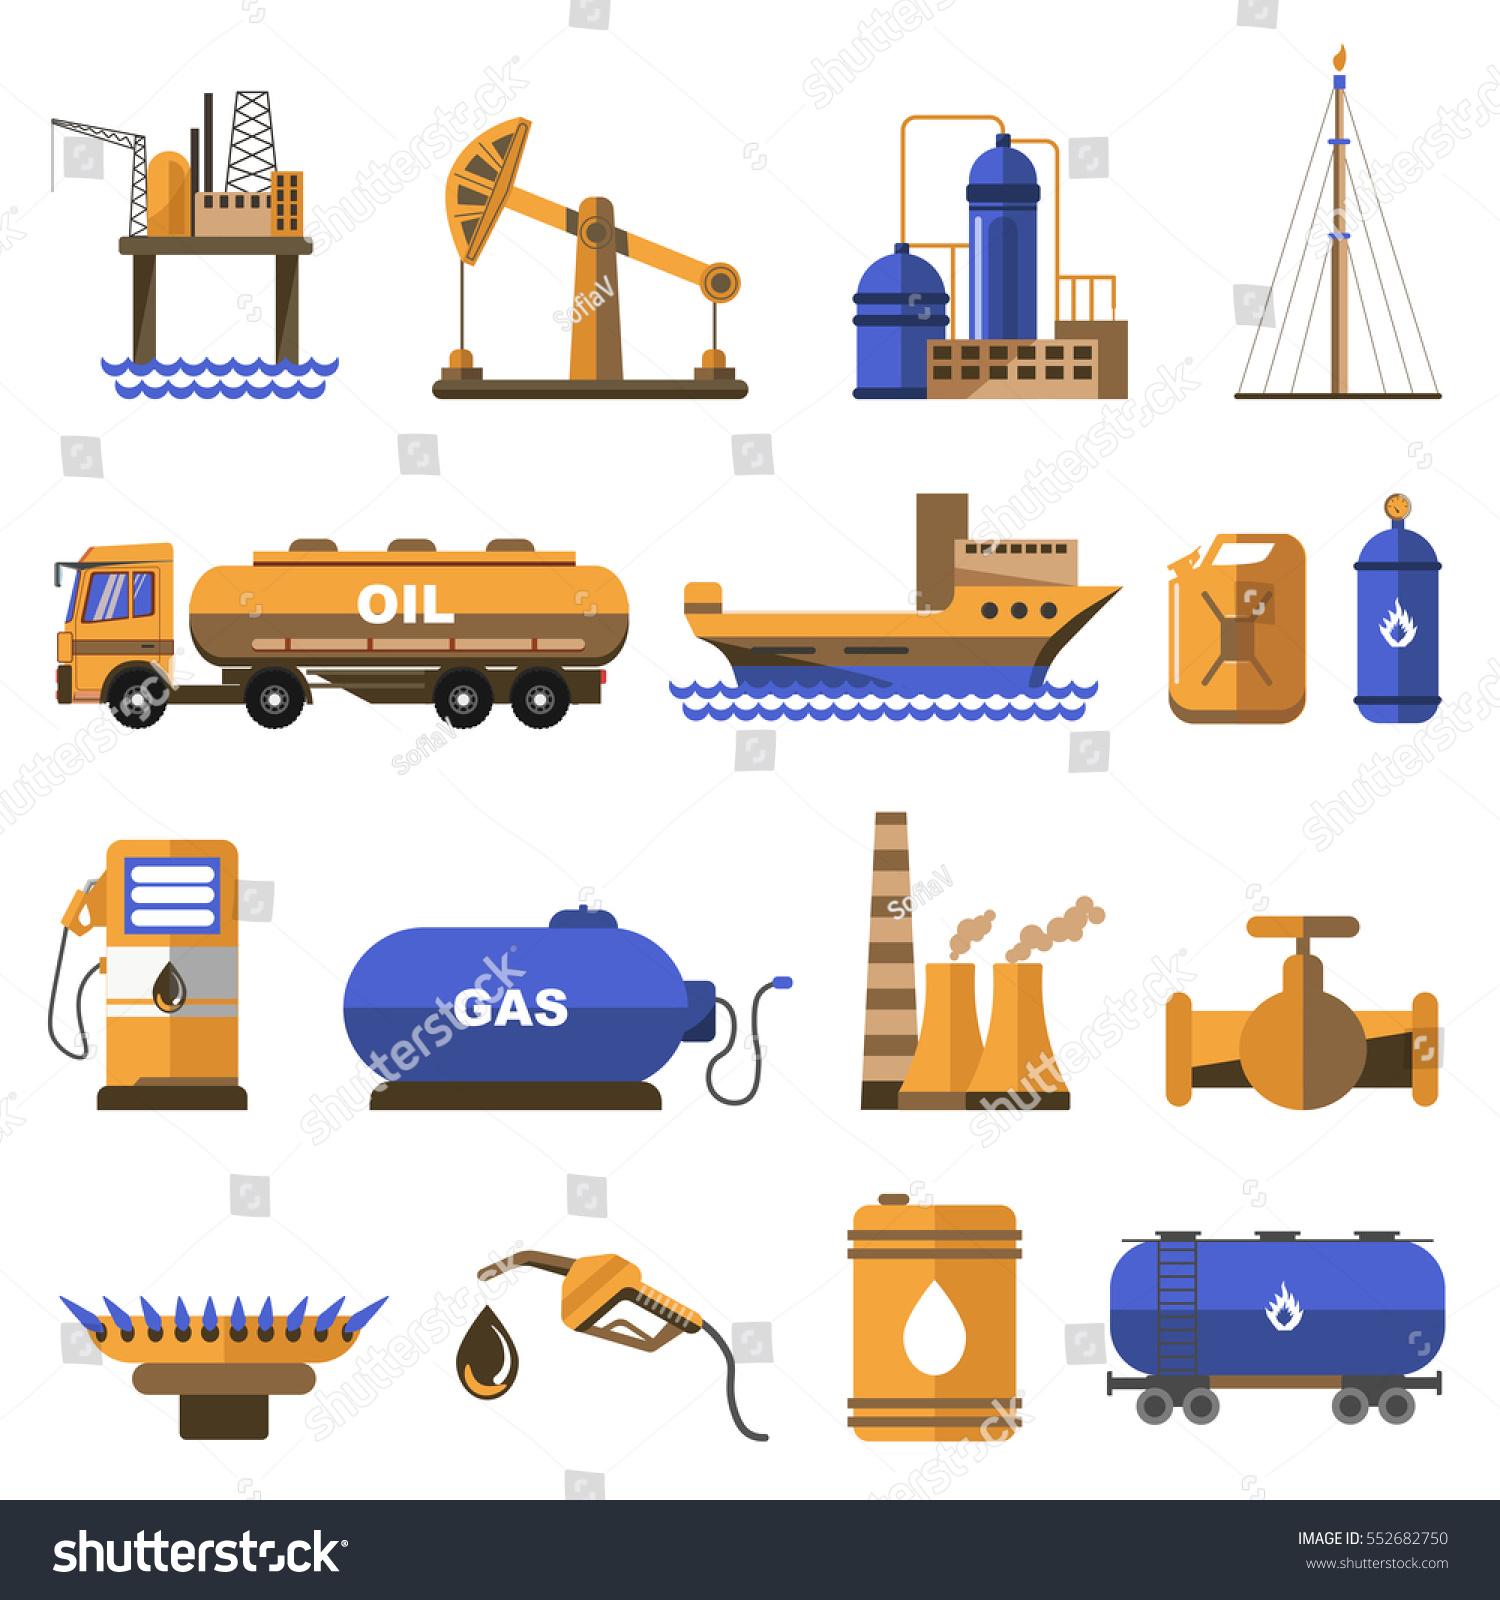 Oil gas icons set symbols refinery stock vector 552682750 oil and gas icons set symbols of refinery industry offshore platform for petroleum extraction buycottarizona